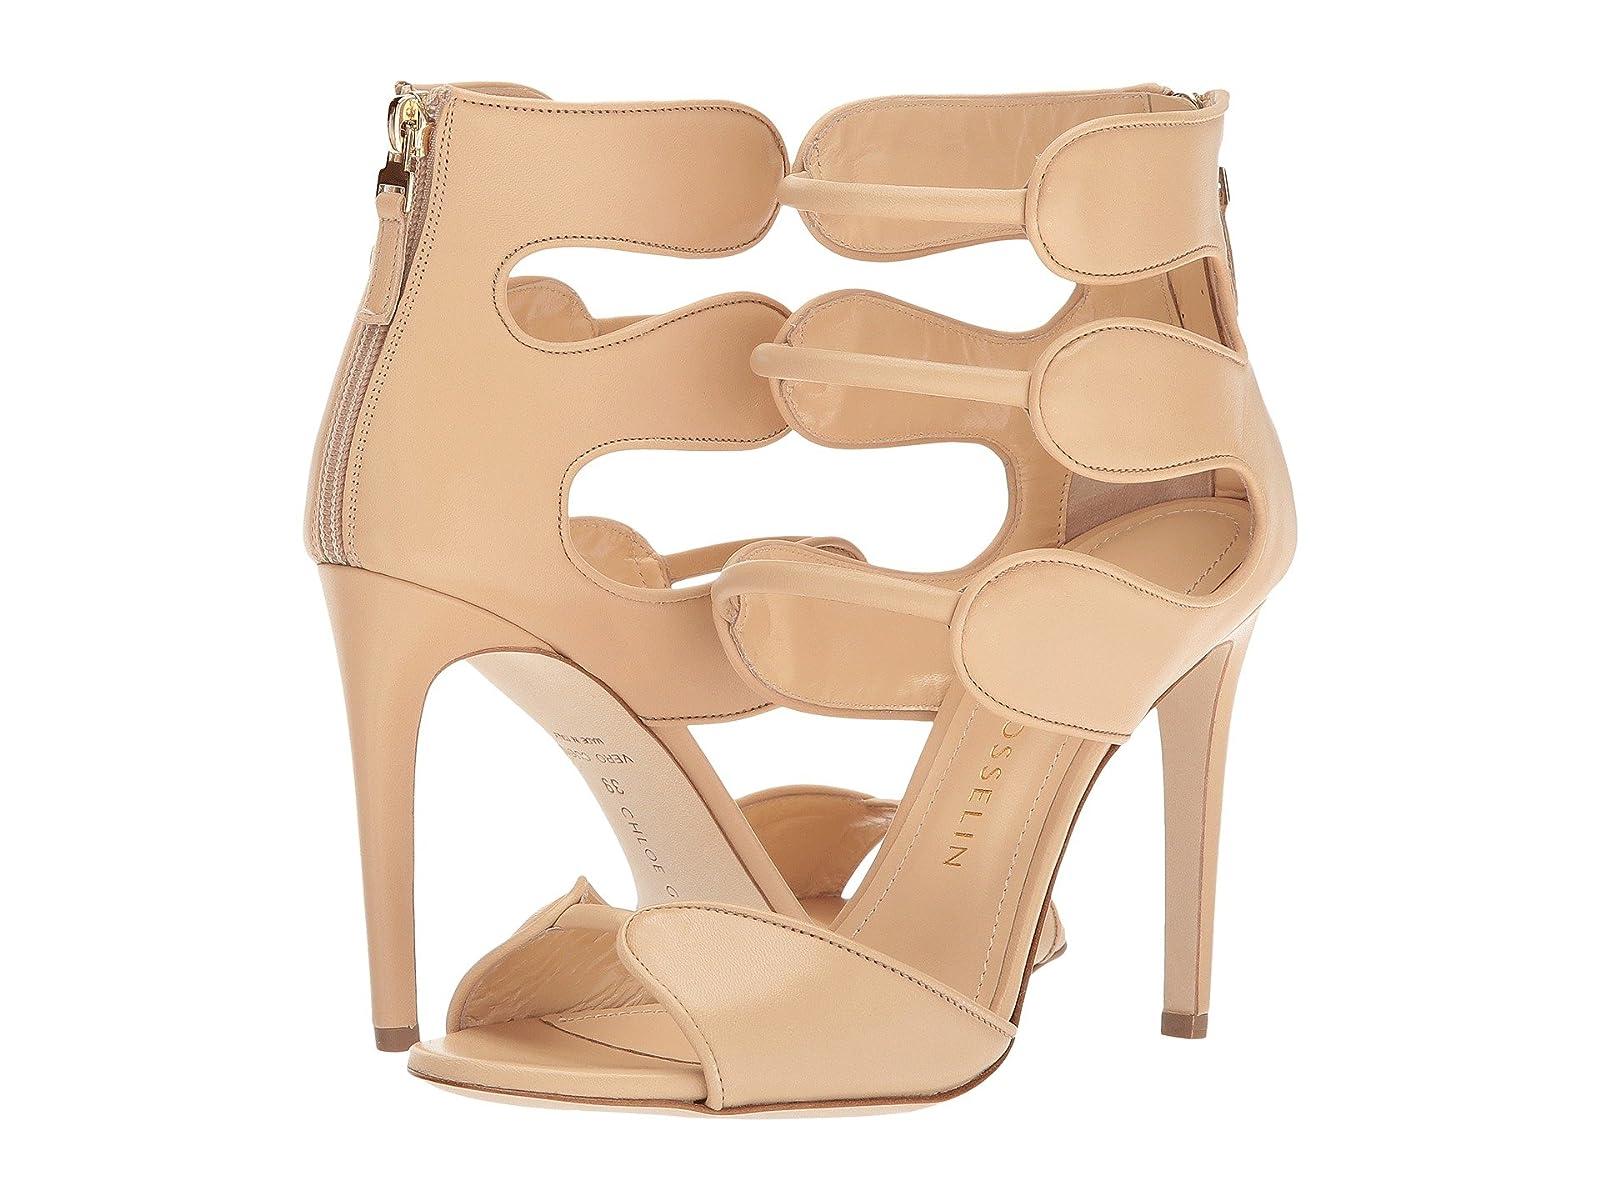 CHLOE GOSSELIN Larkspur Calf Suede HeelCheap and distinctive eye-catching shoes